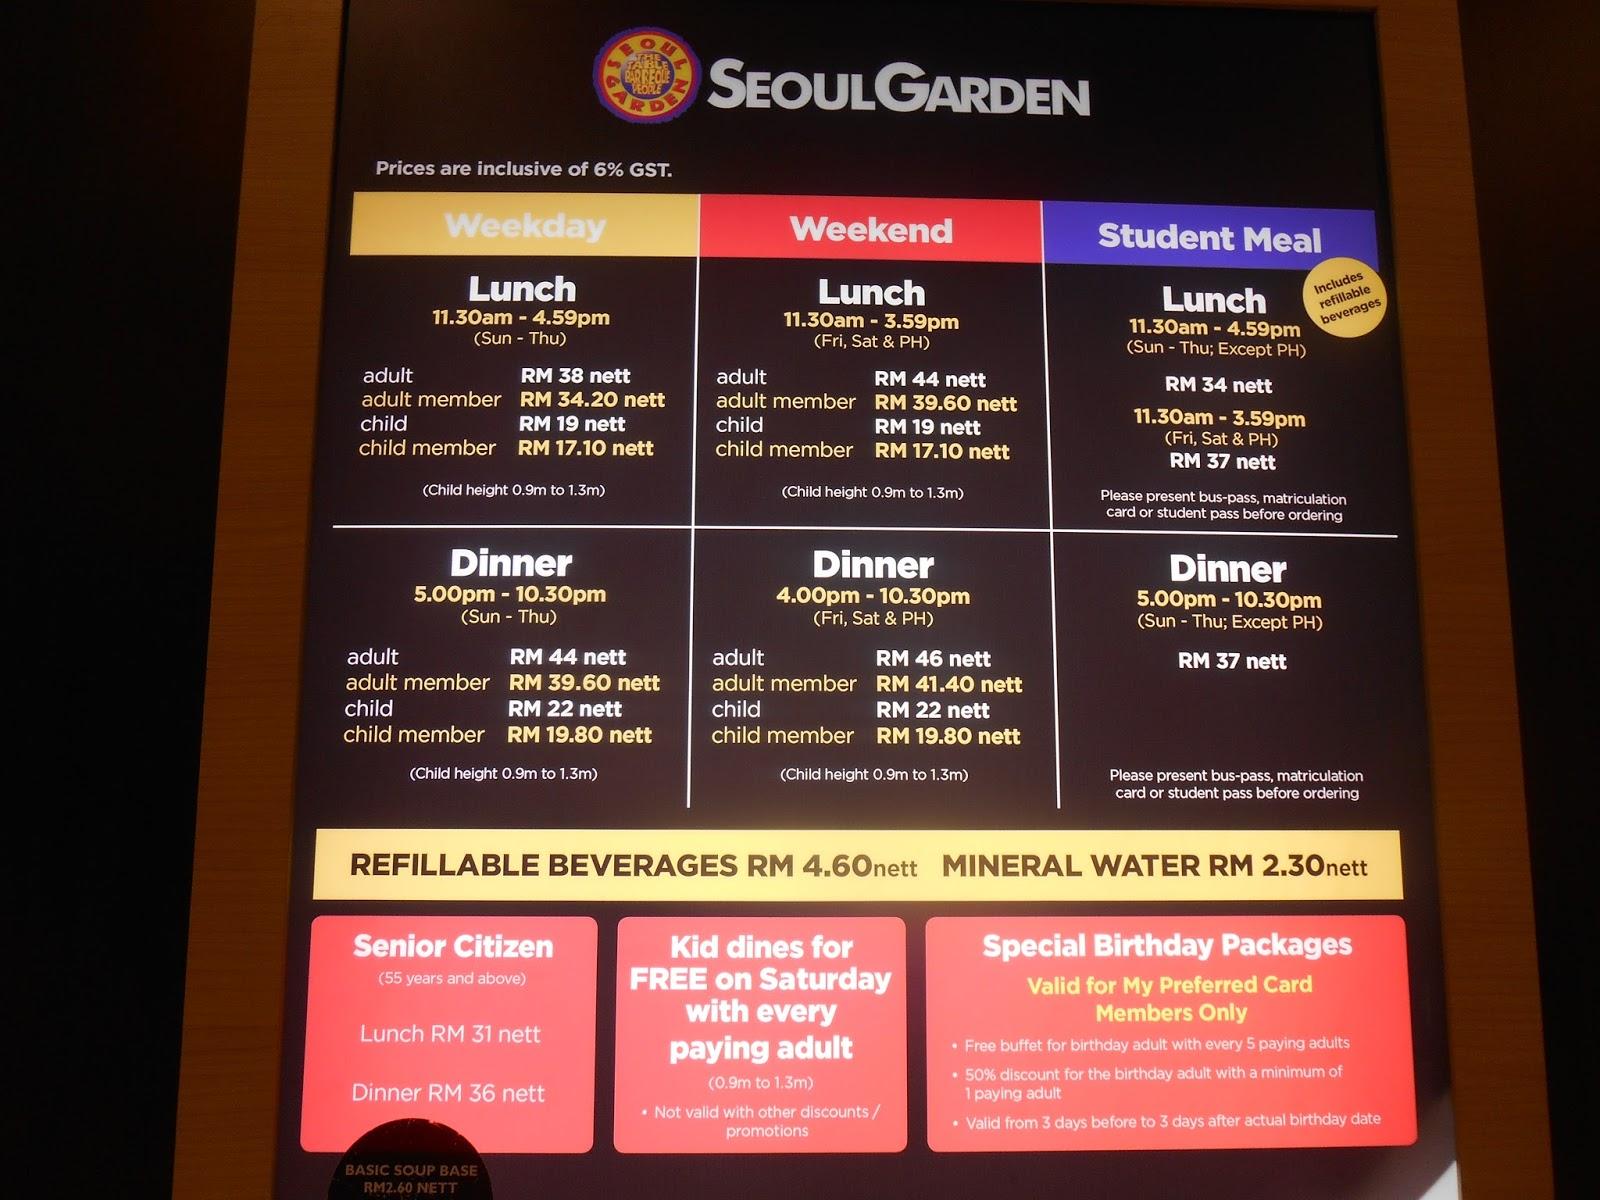 Seoul Garden Dan Ms Bab Korean Food Emporium Aman Central Alor Setar